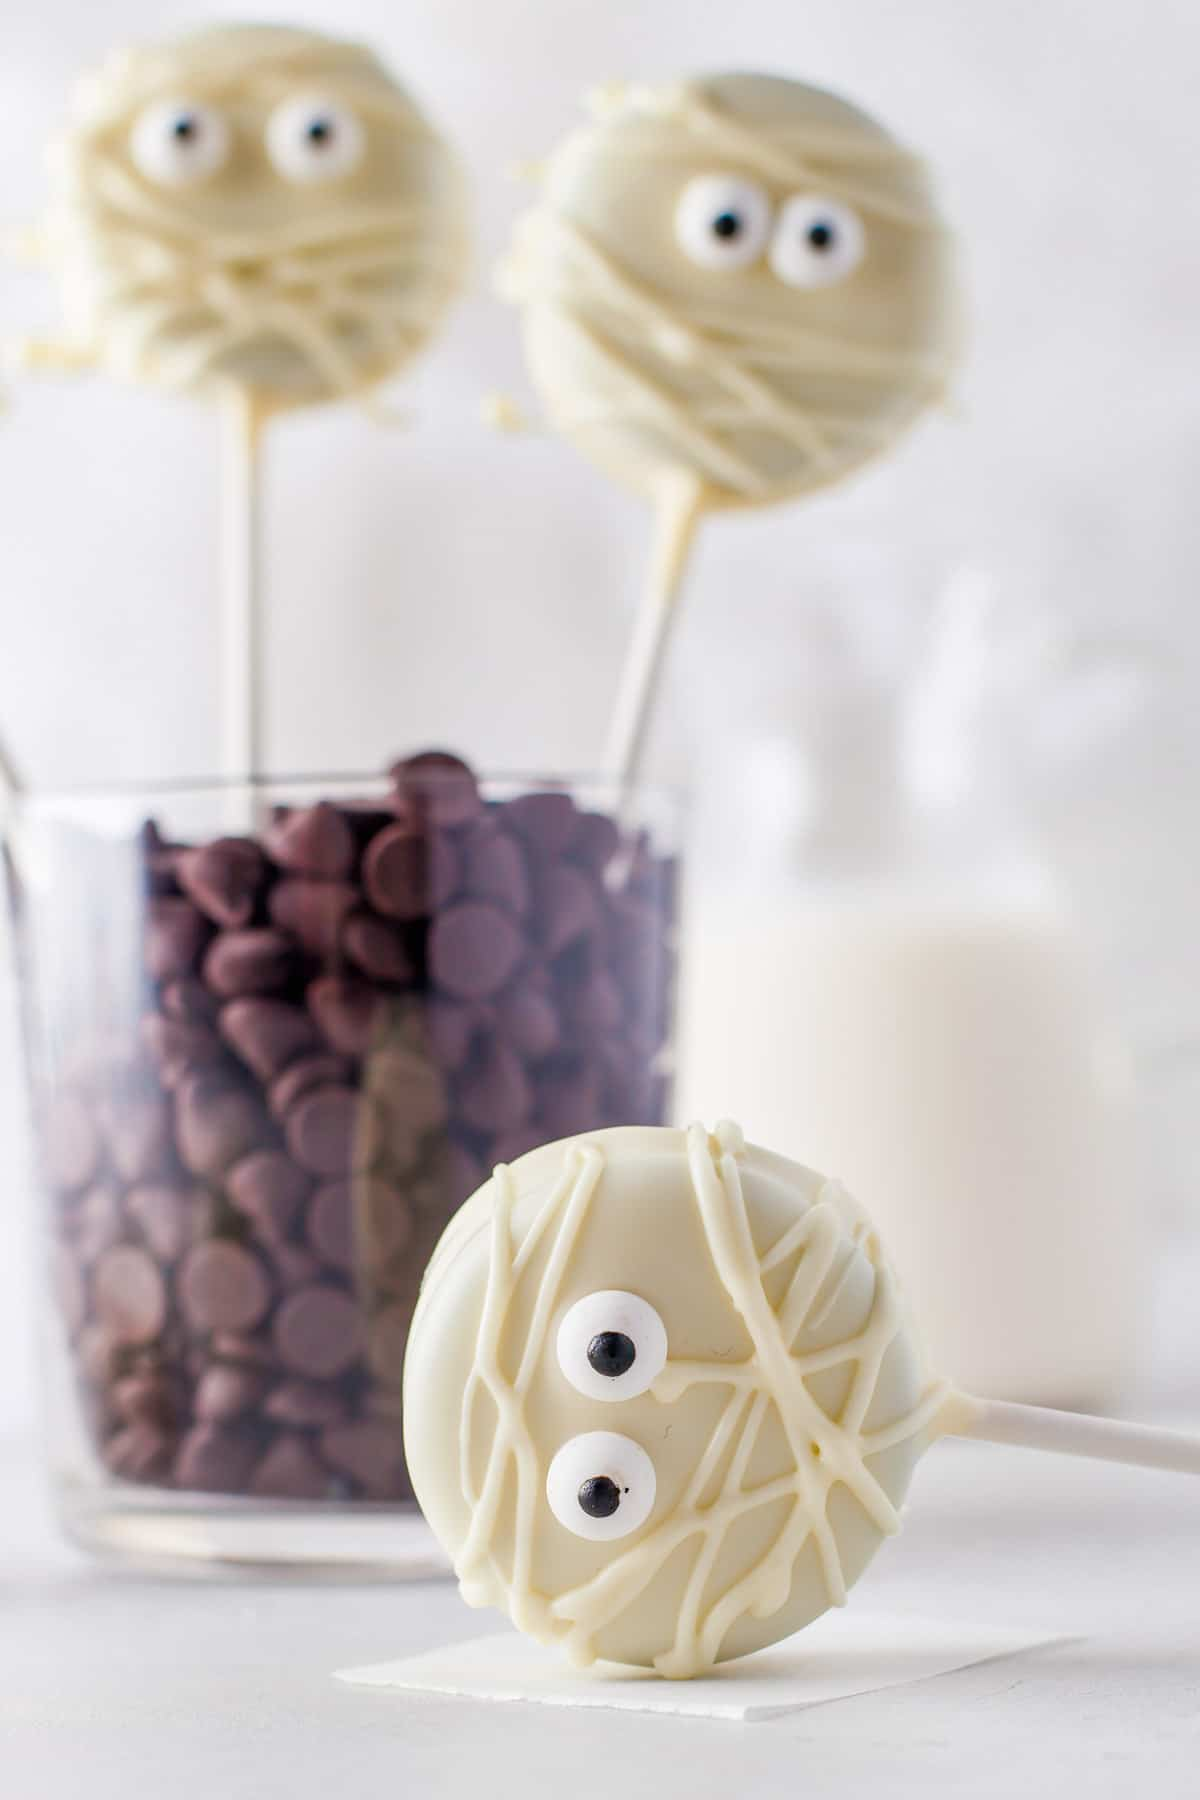 mummy oreo cookie pop on surface